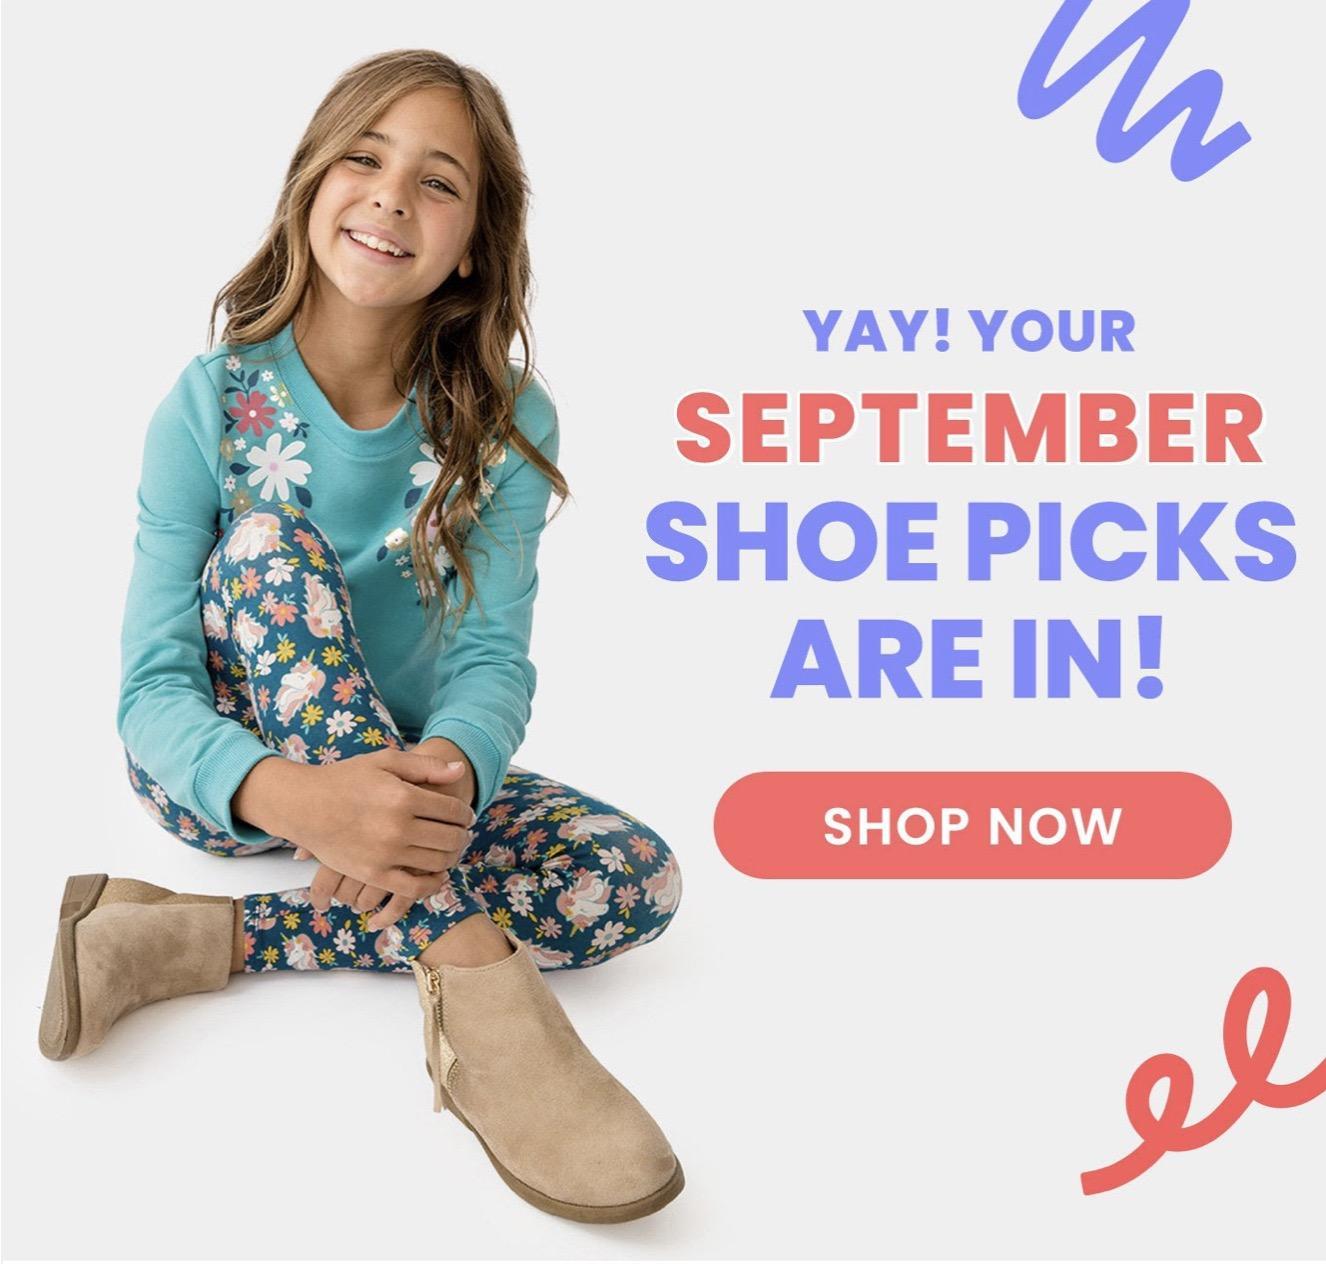 September 2021 FabKids Selection Time + New Subscriber Offer